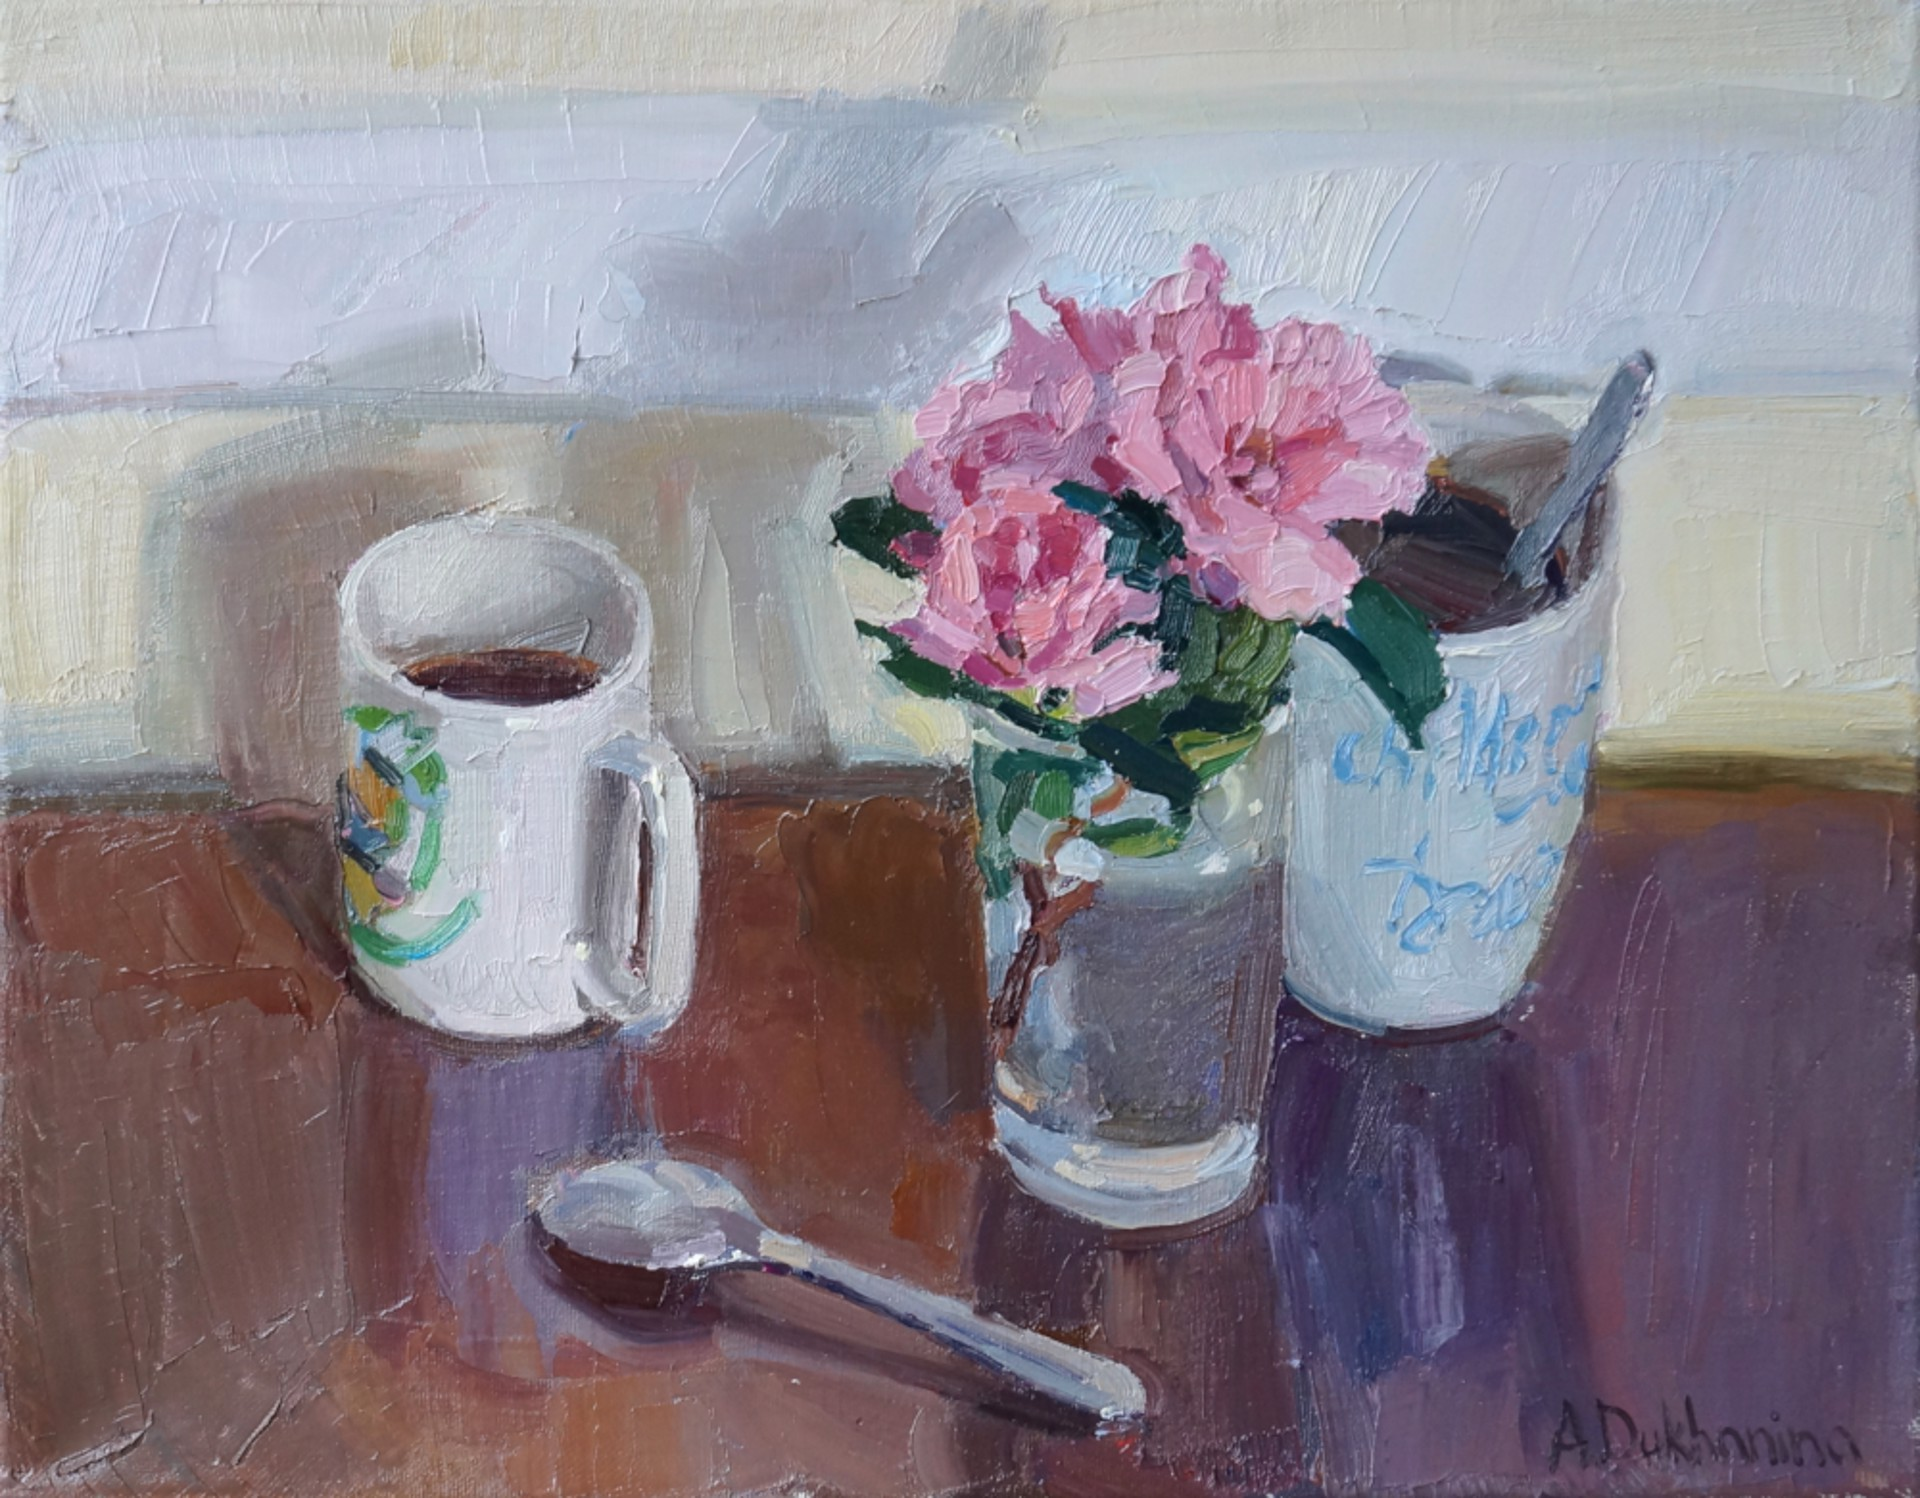 Two Cups of Coffee by Anastasia Dukhanina